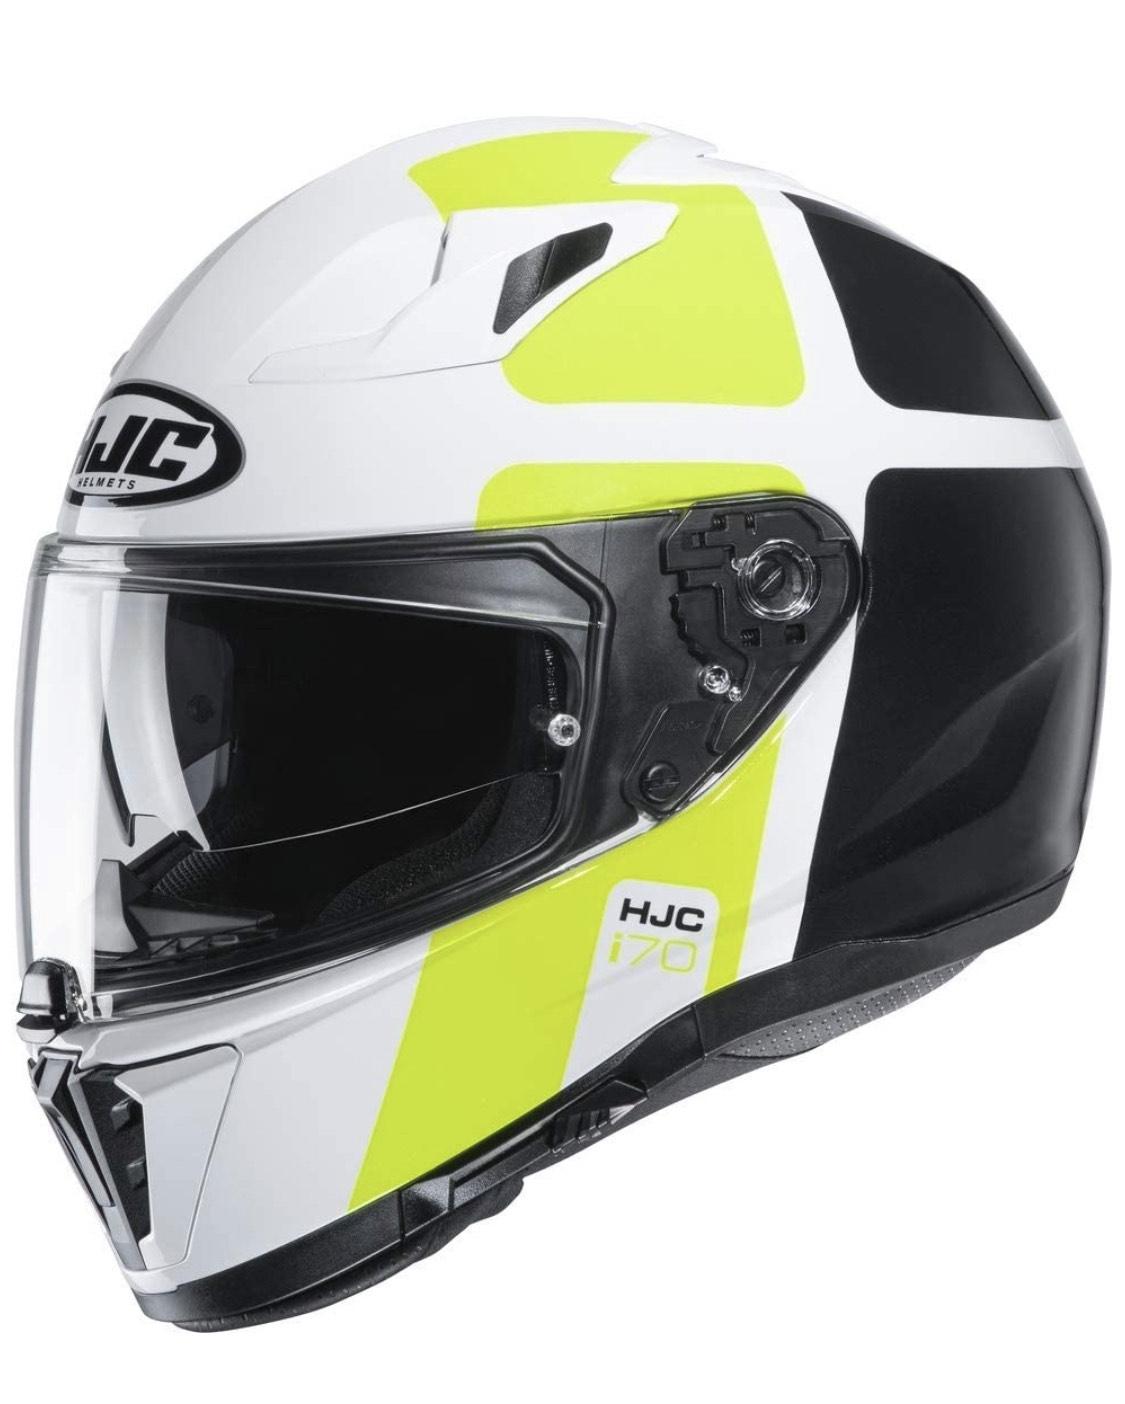 Casco de moto HJC I70. Talla M